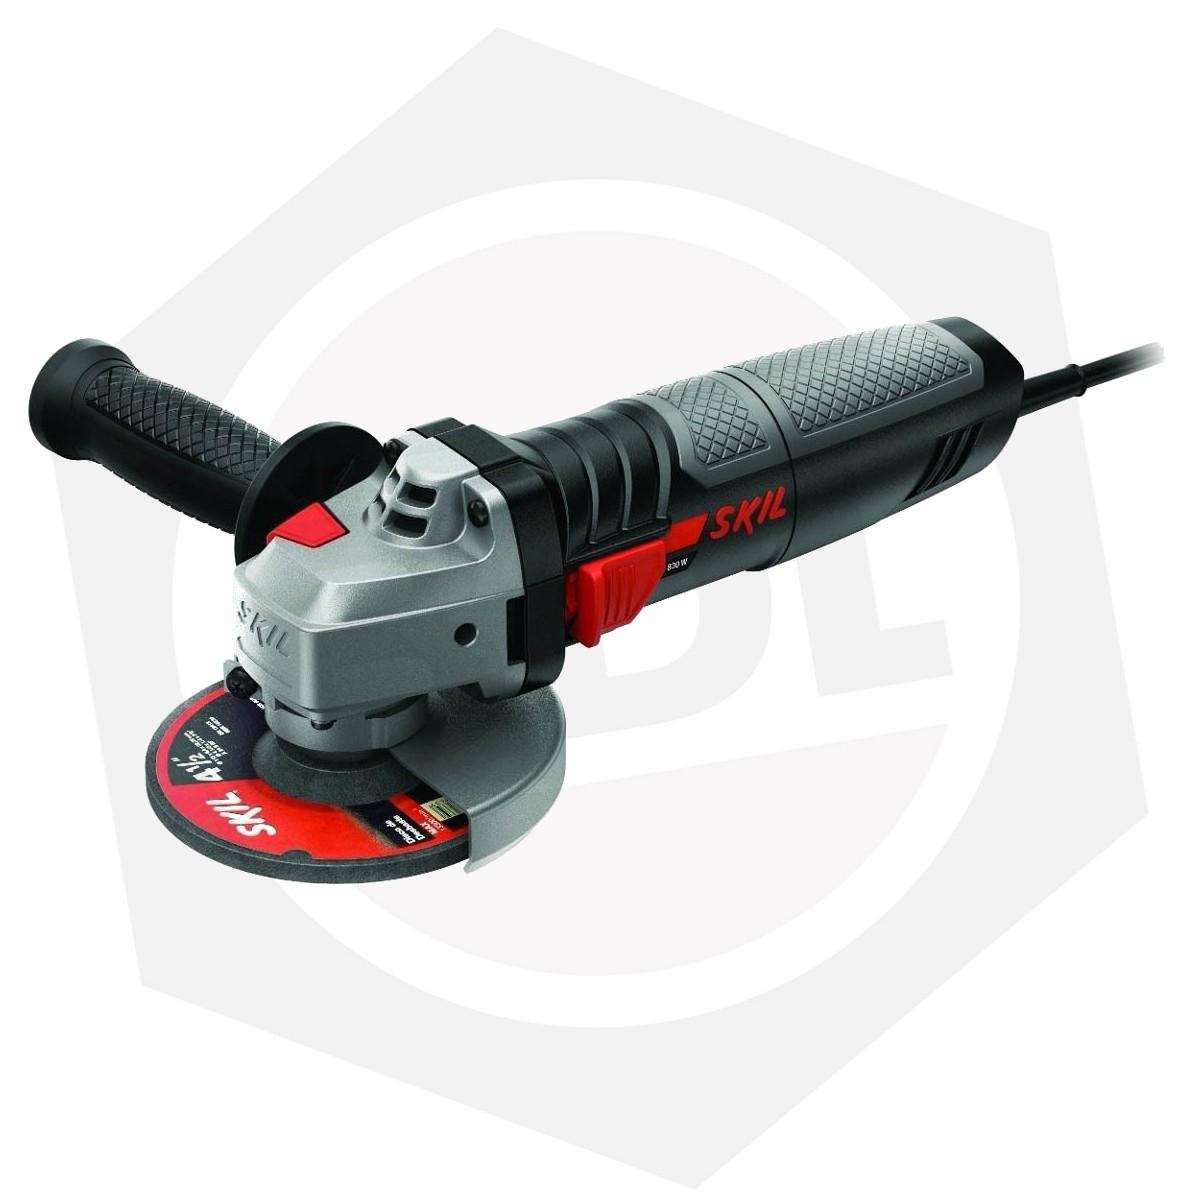 OFERTA - 10% DE DESCUENTO - Amoladora Angular Skil 9004 JR - 830 W